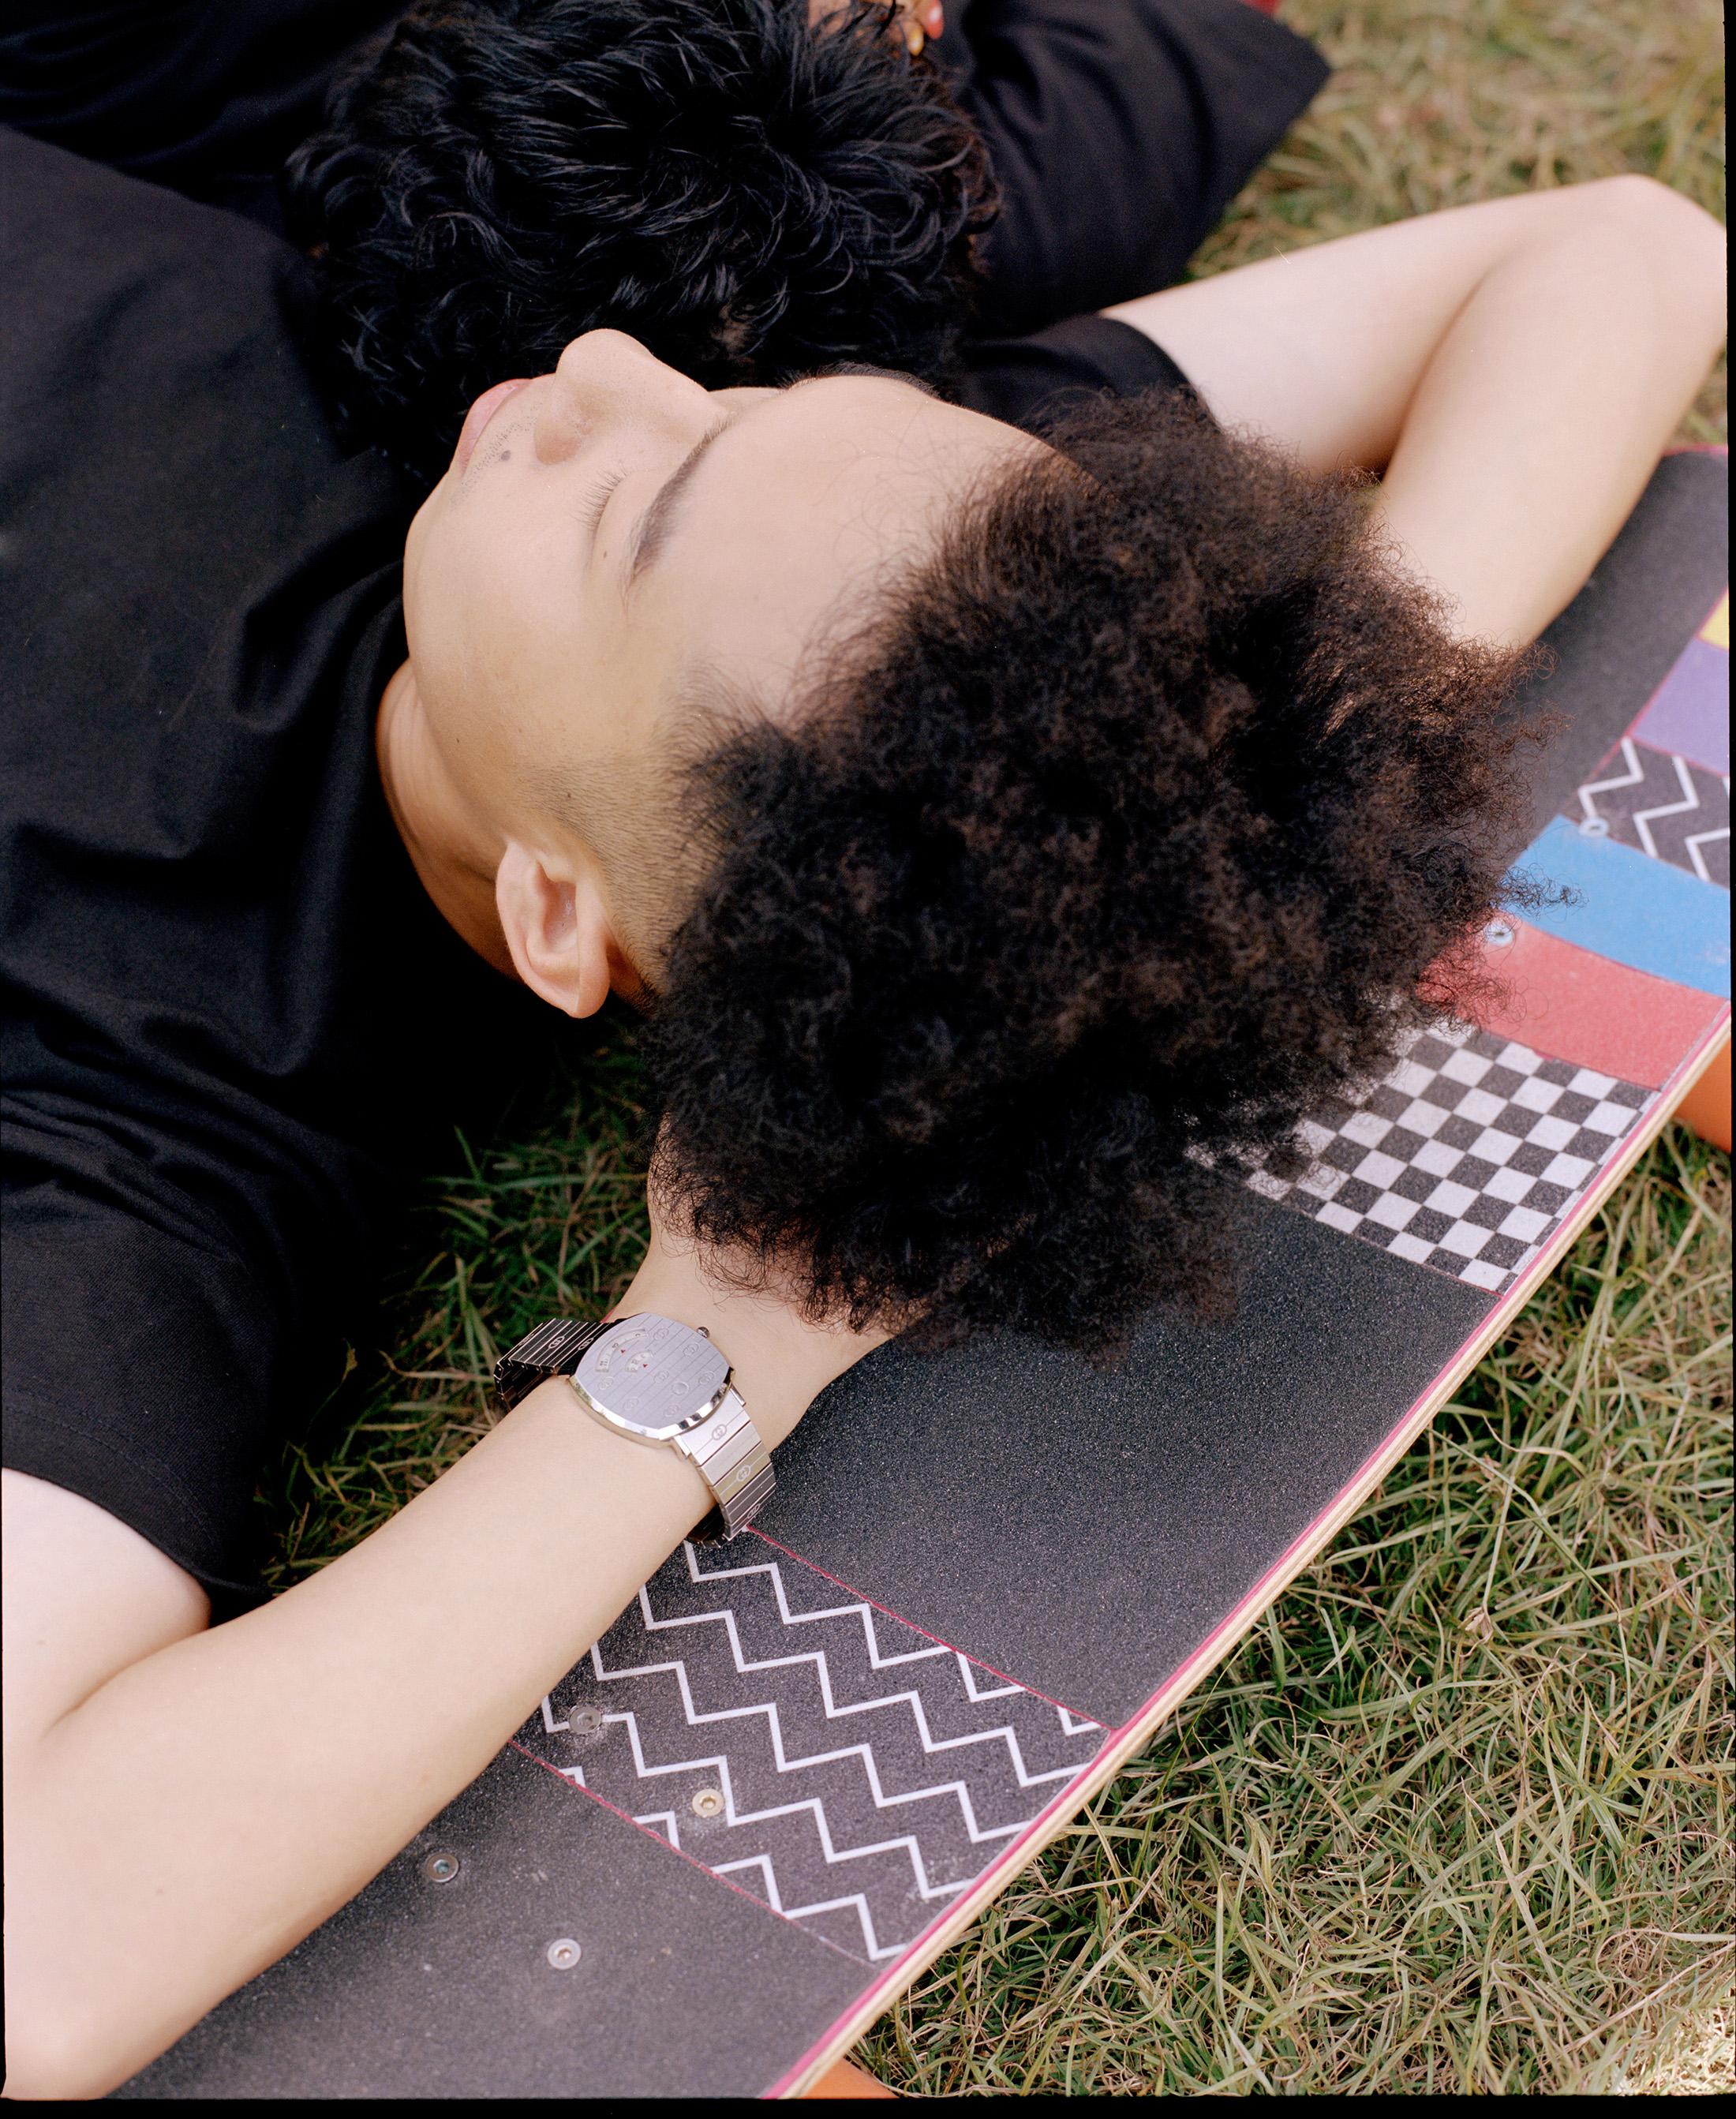 Gucci Grip Watch Skateboarder Fall 2019 Ad Campaign